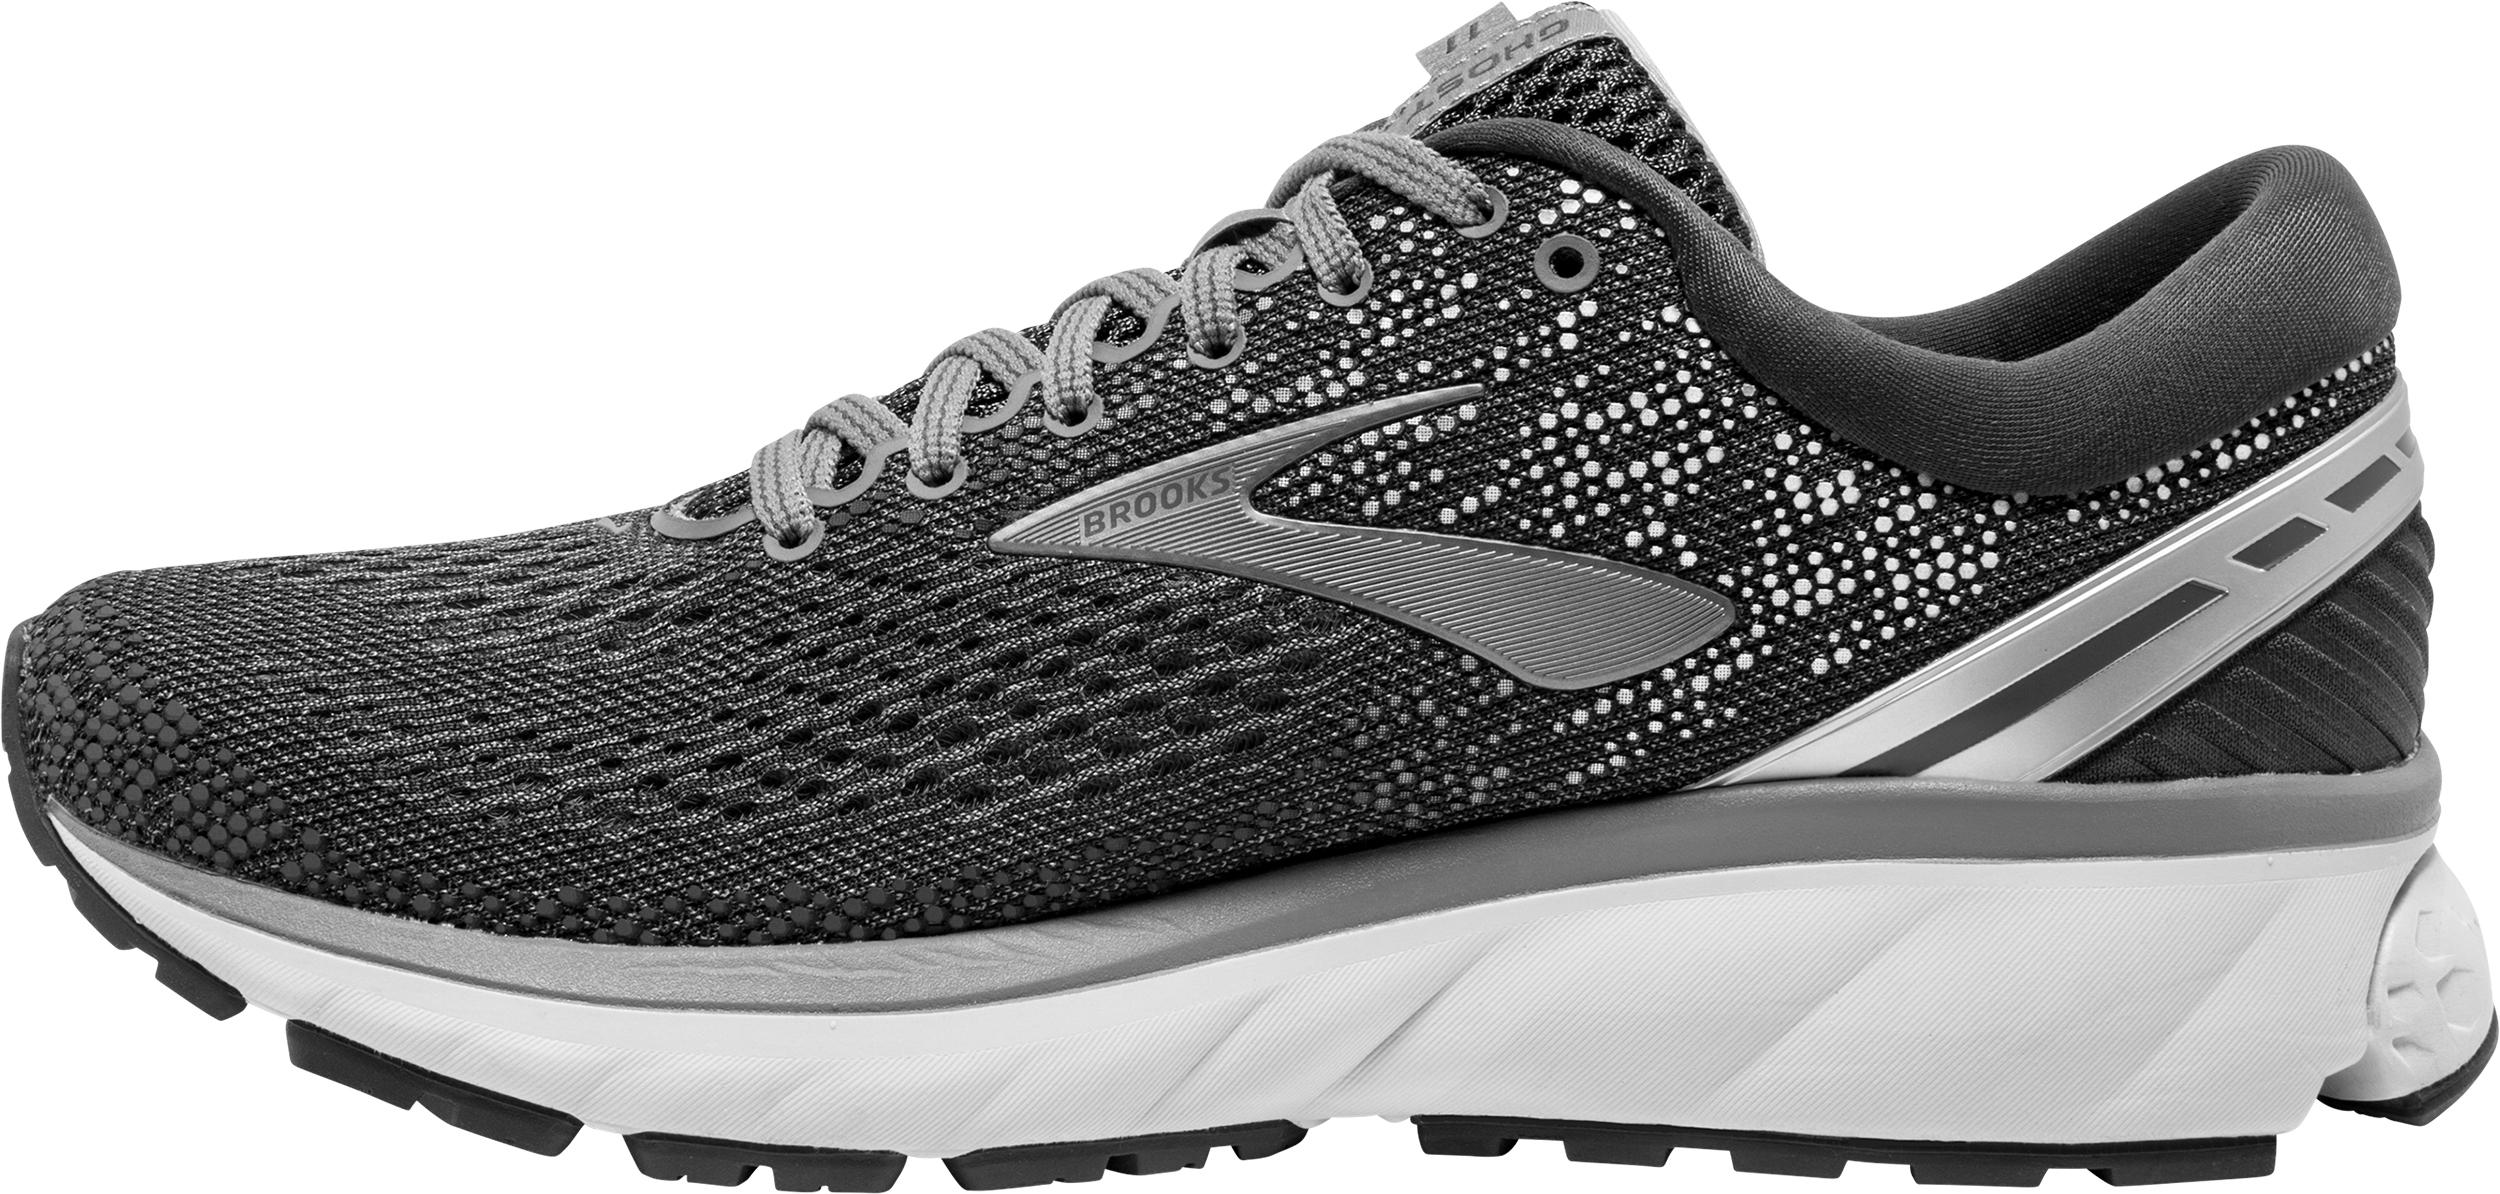 0f220c5cc32 Brooks Ghost 11 Road Running Shoes - Men s